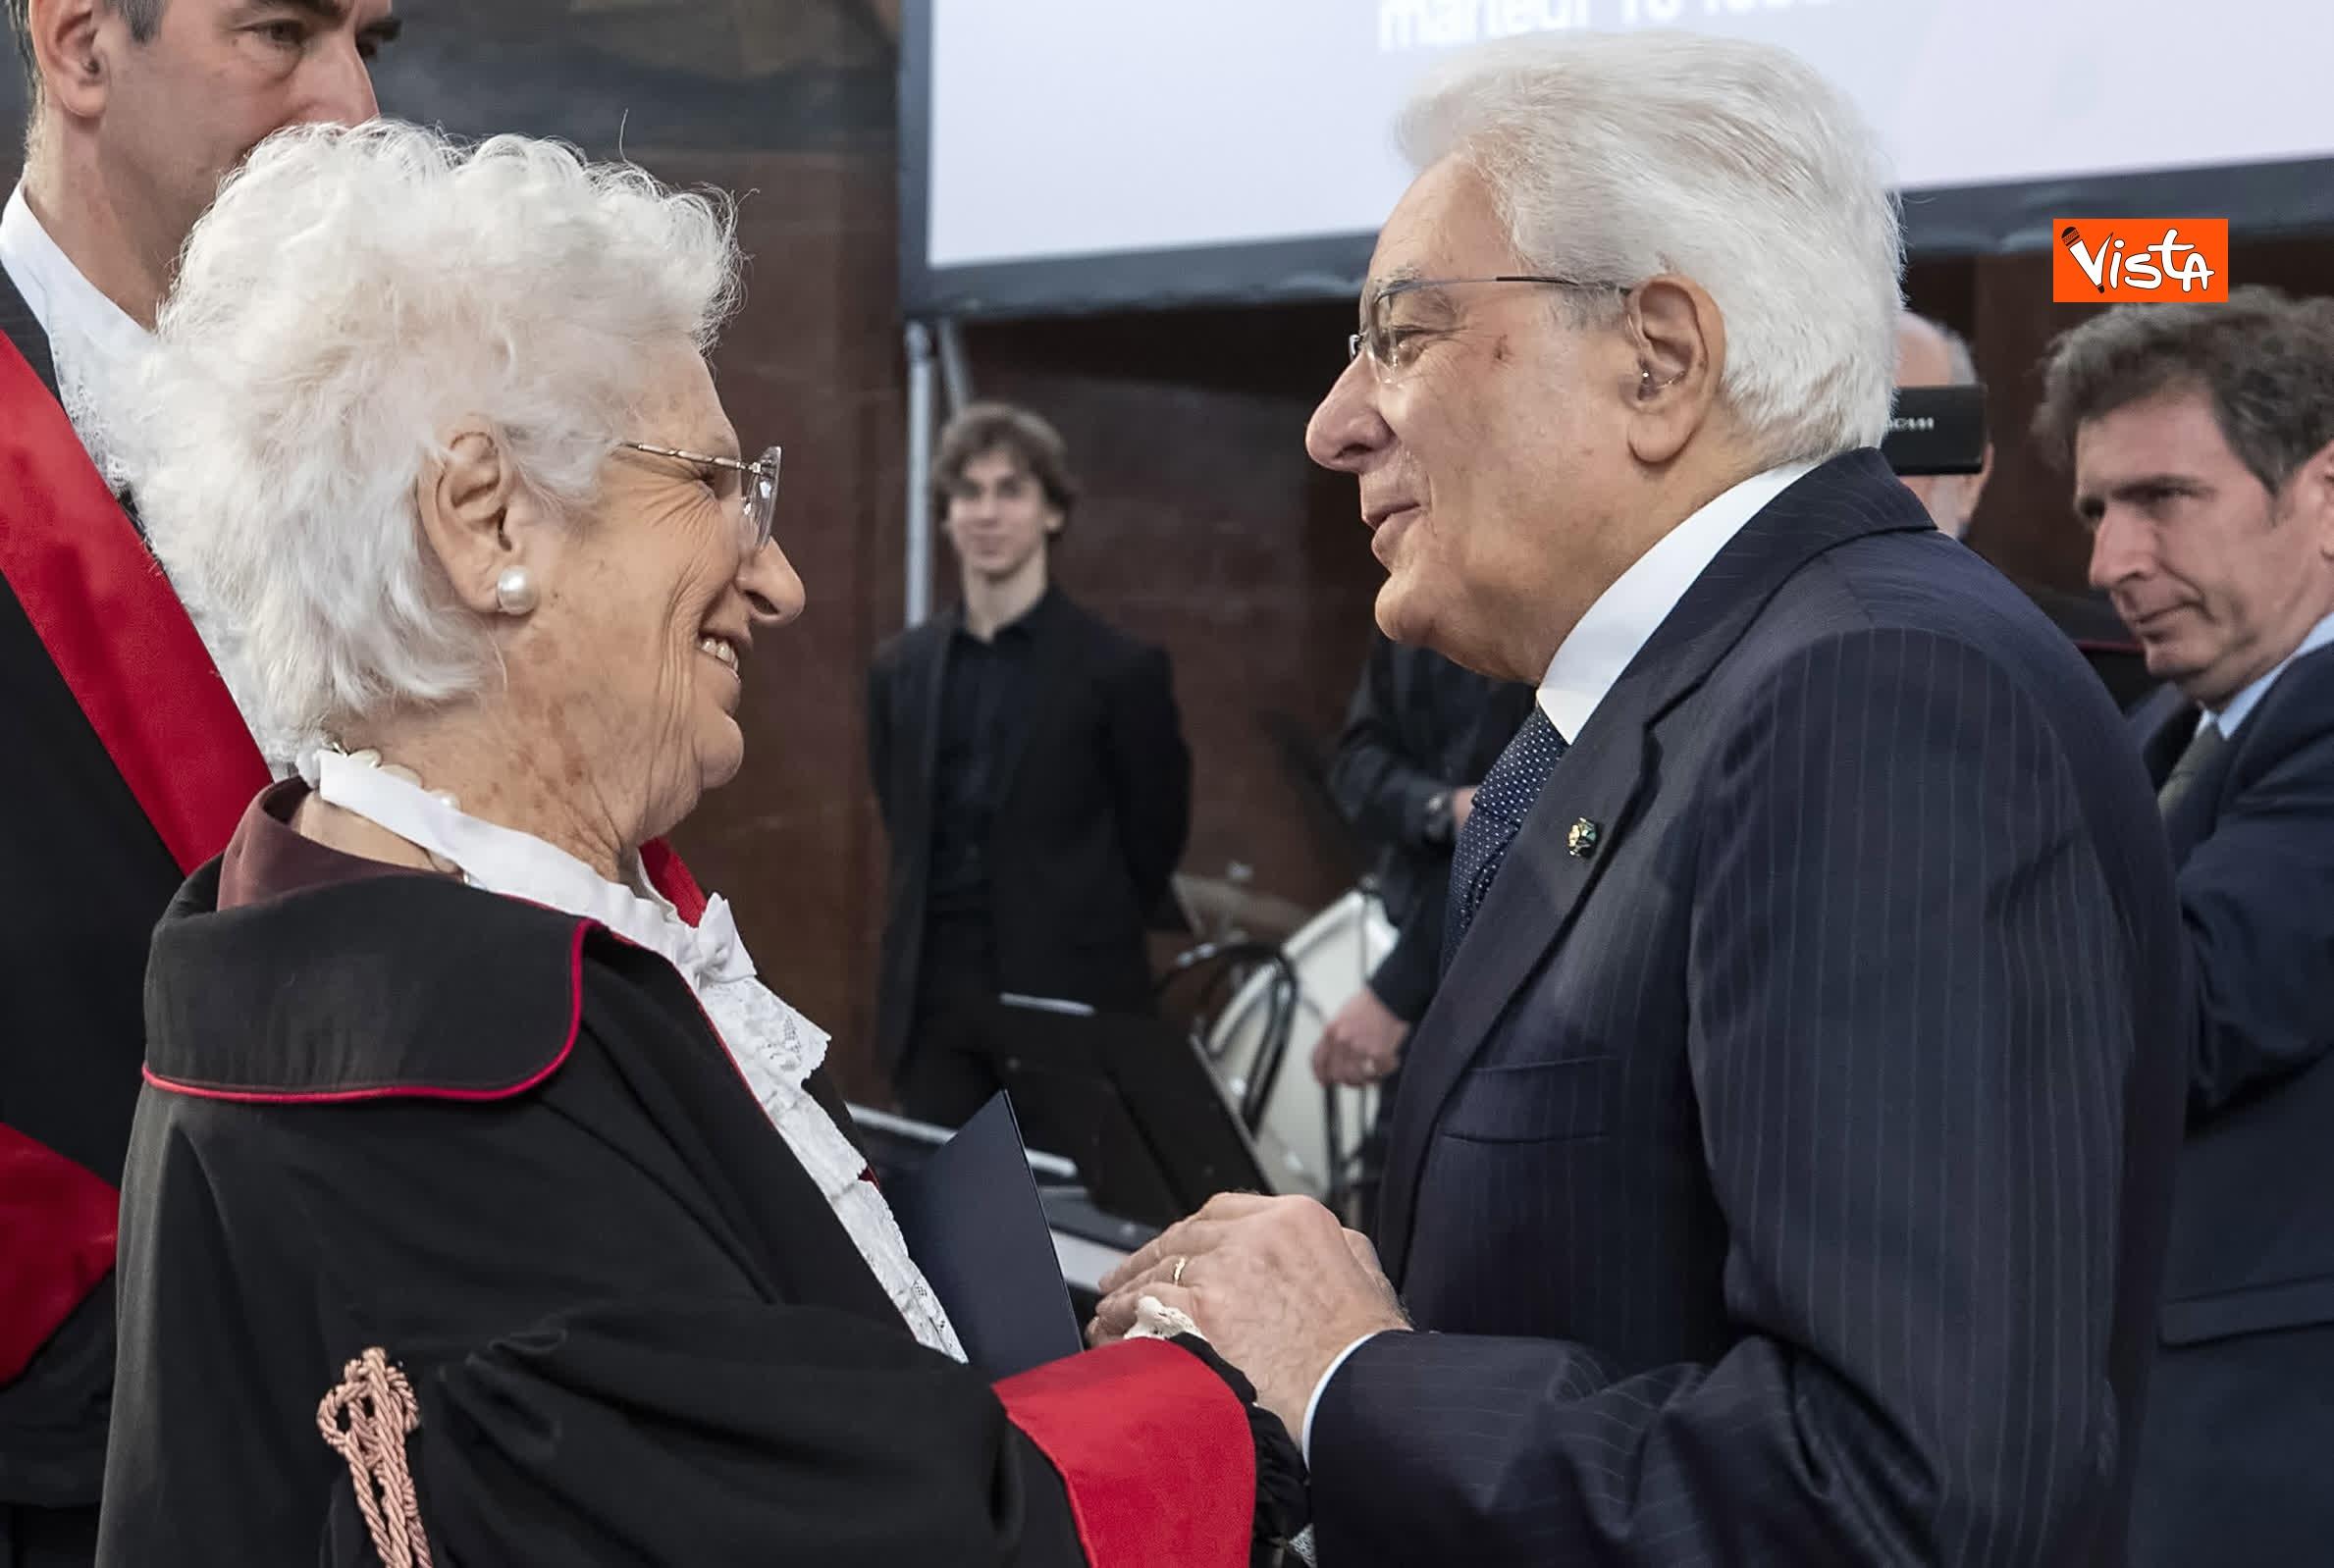 17-02-20 Segre riceve laurea honoris causa dal rettore della Sapienza Gaudio_07